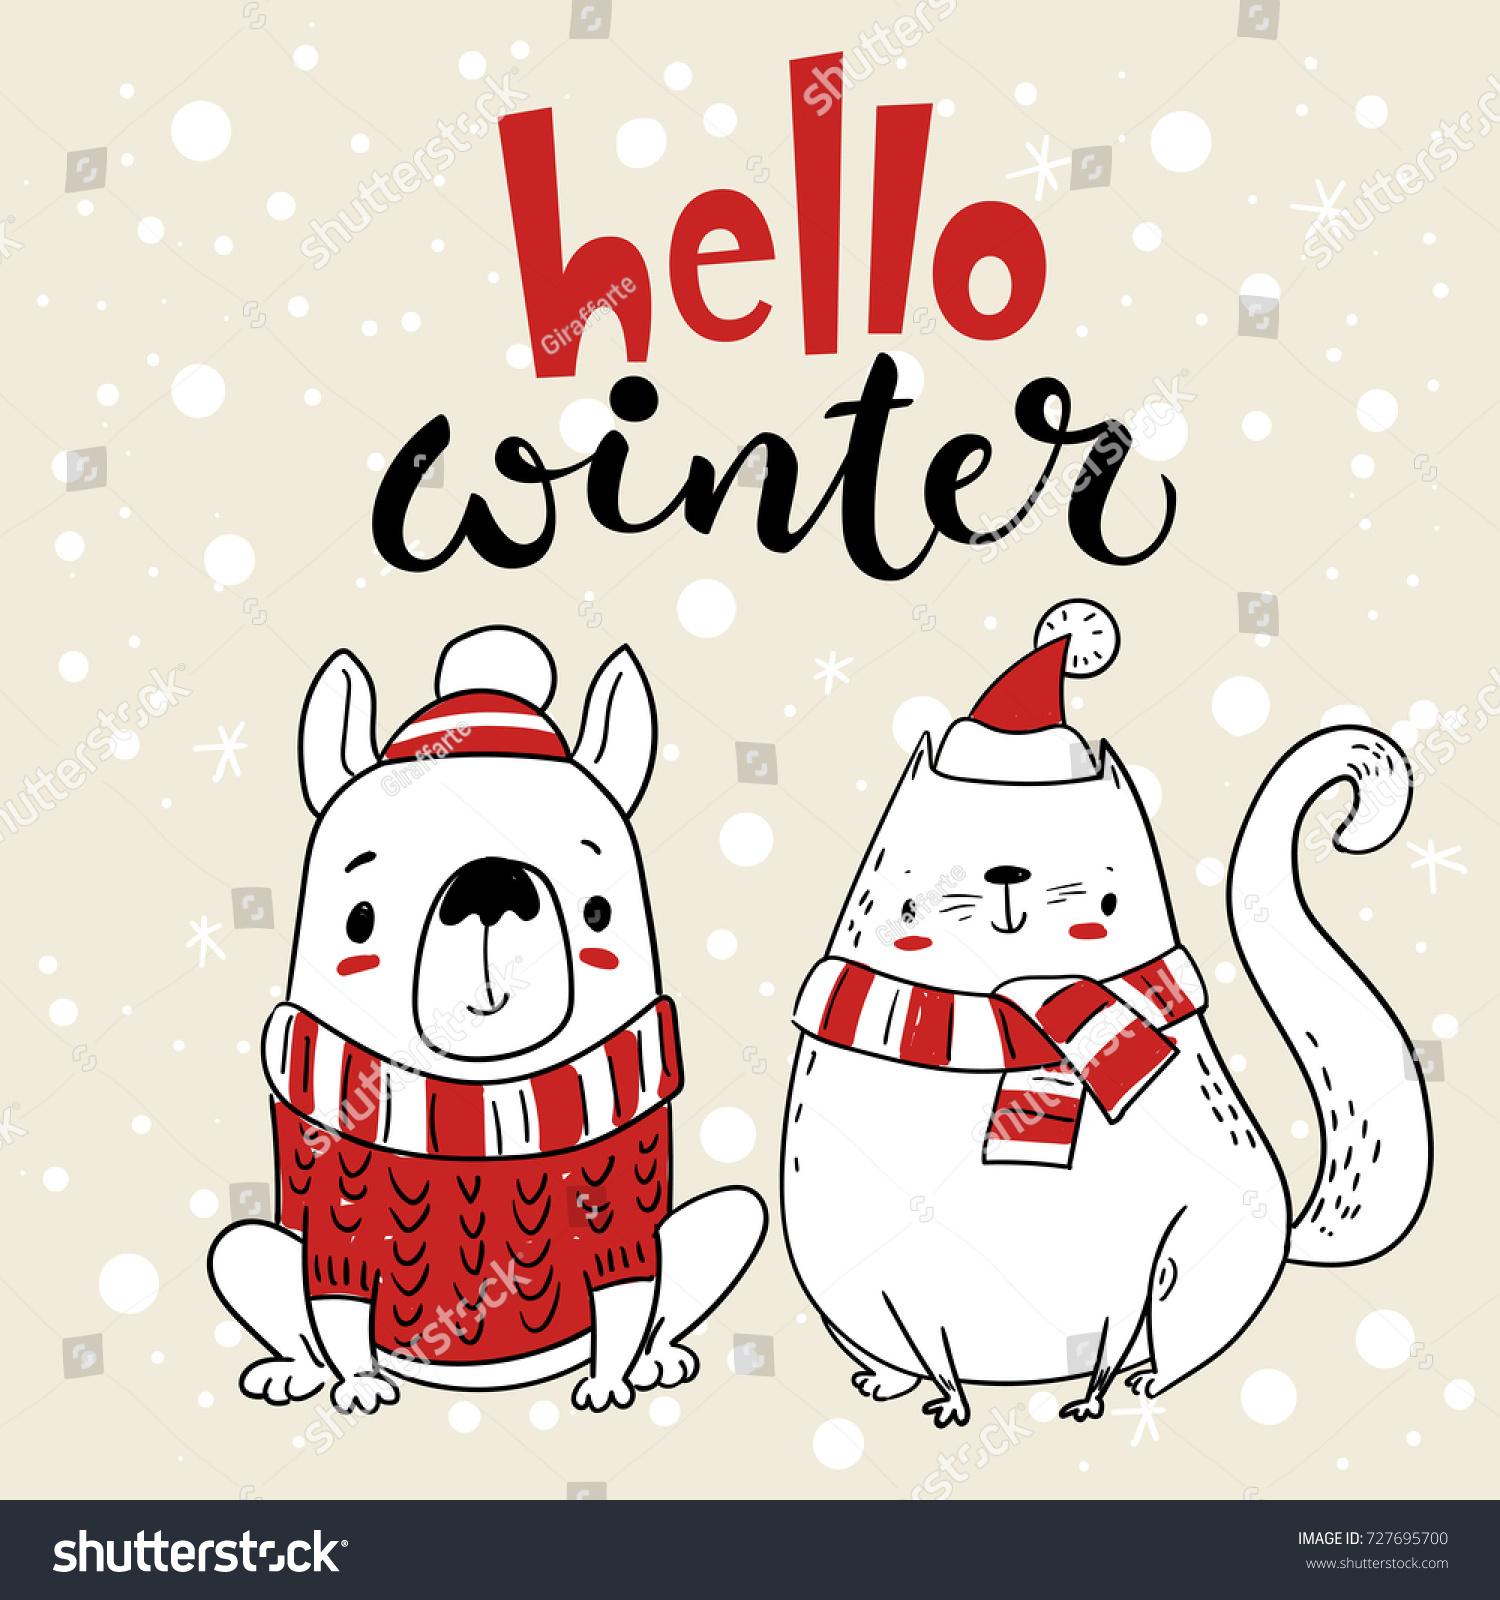 Vector Christmas Card Greeting Card Cartoon Stock Vector (Royalty ...